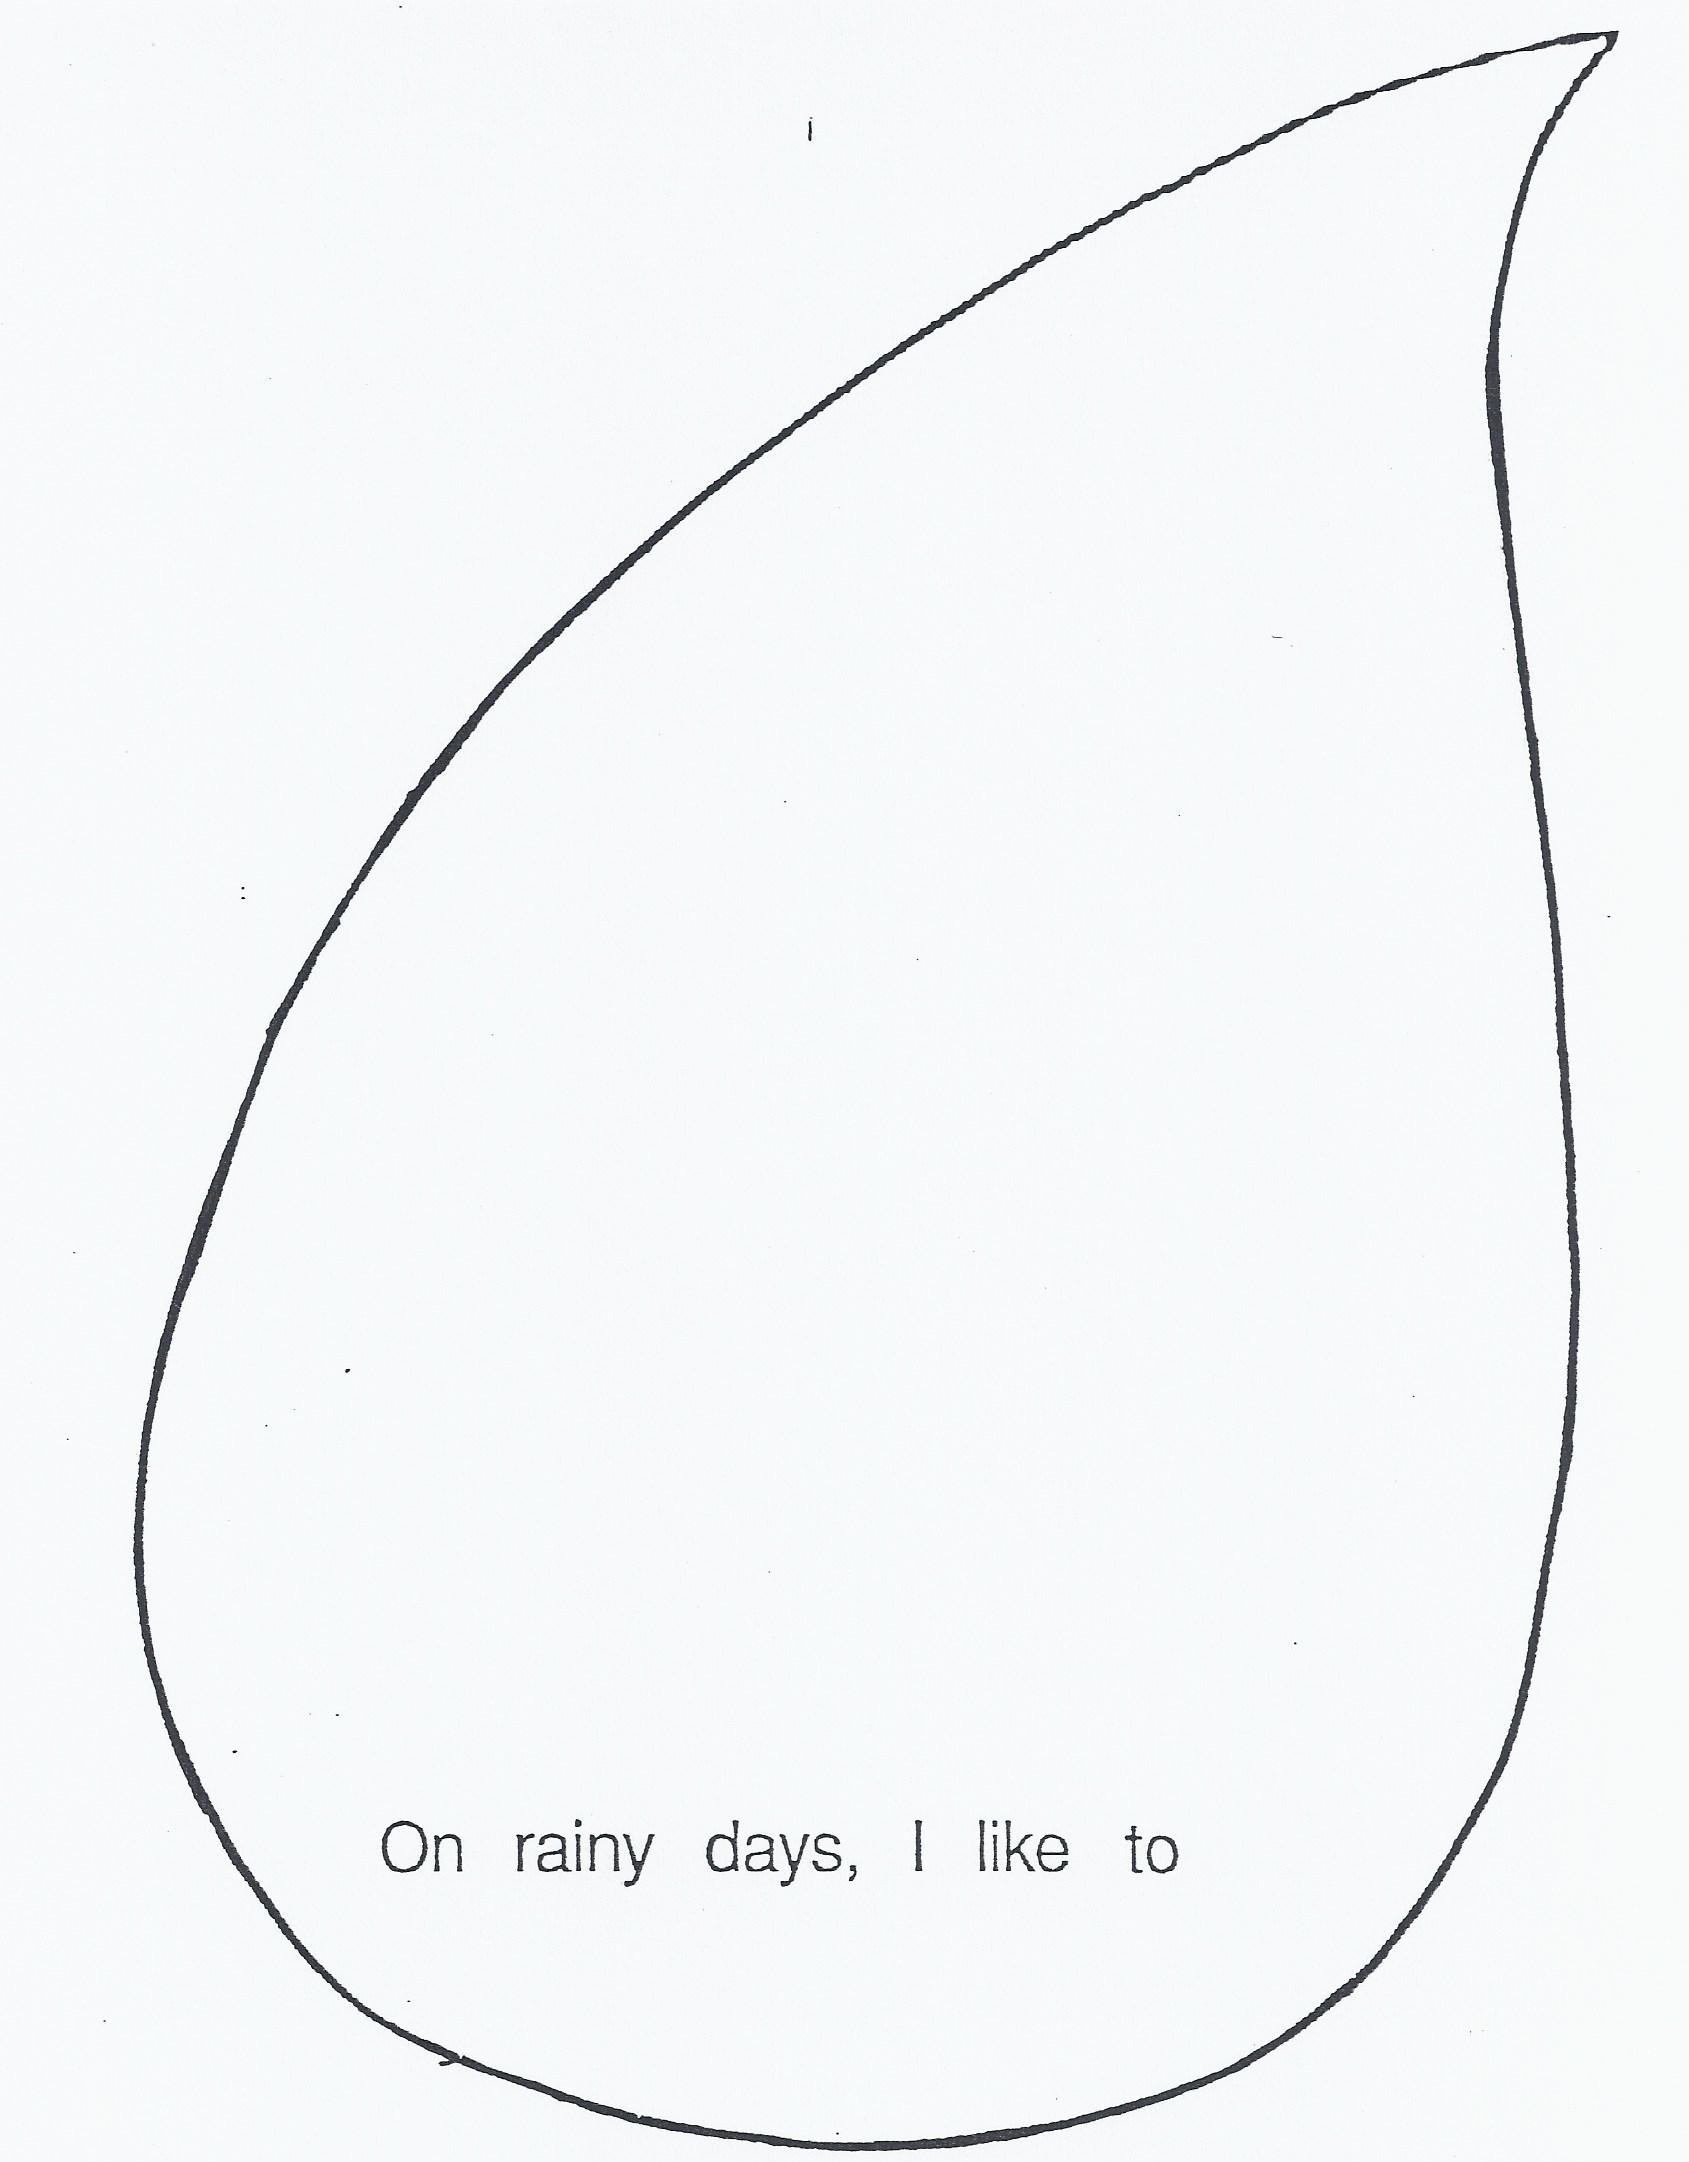 Rain Drop Template. raindrop template clipart best. raindrops.